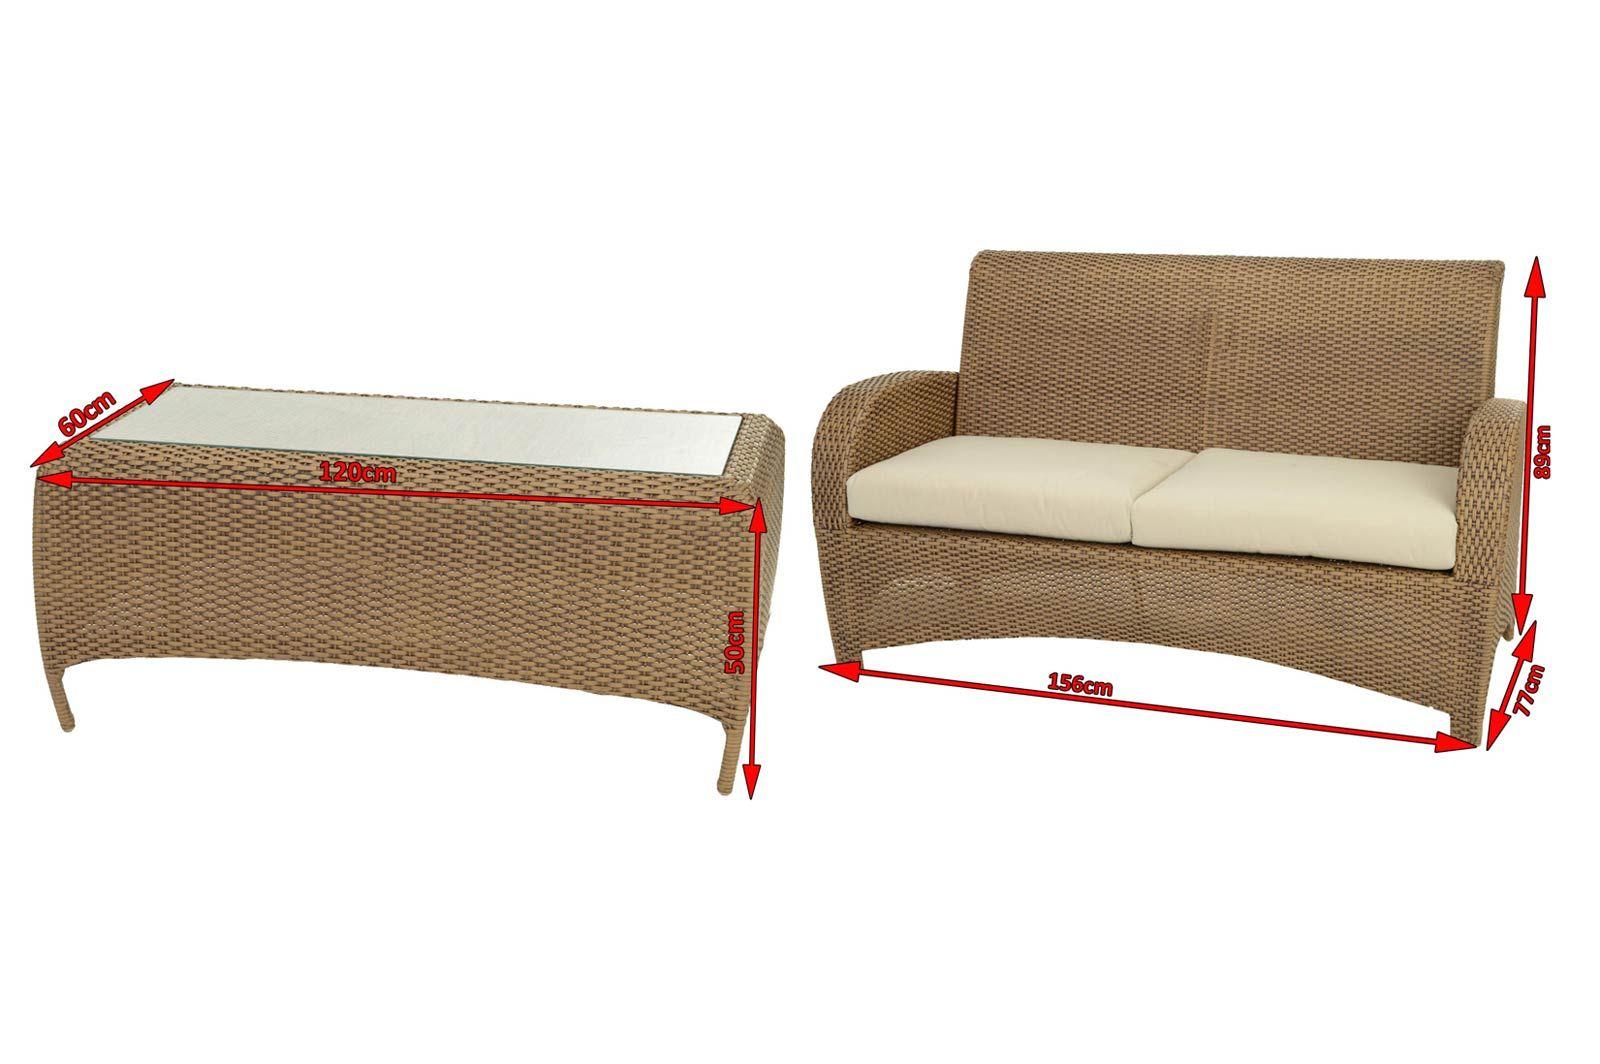 Garvida Farnese Sofa Set Natur Tisch 2er Sofa Gartenmoebel De Silah